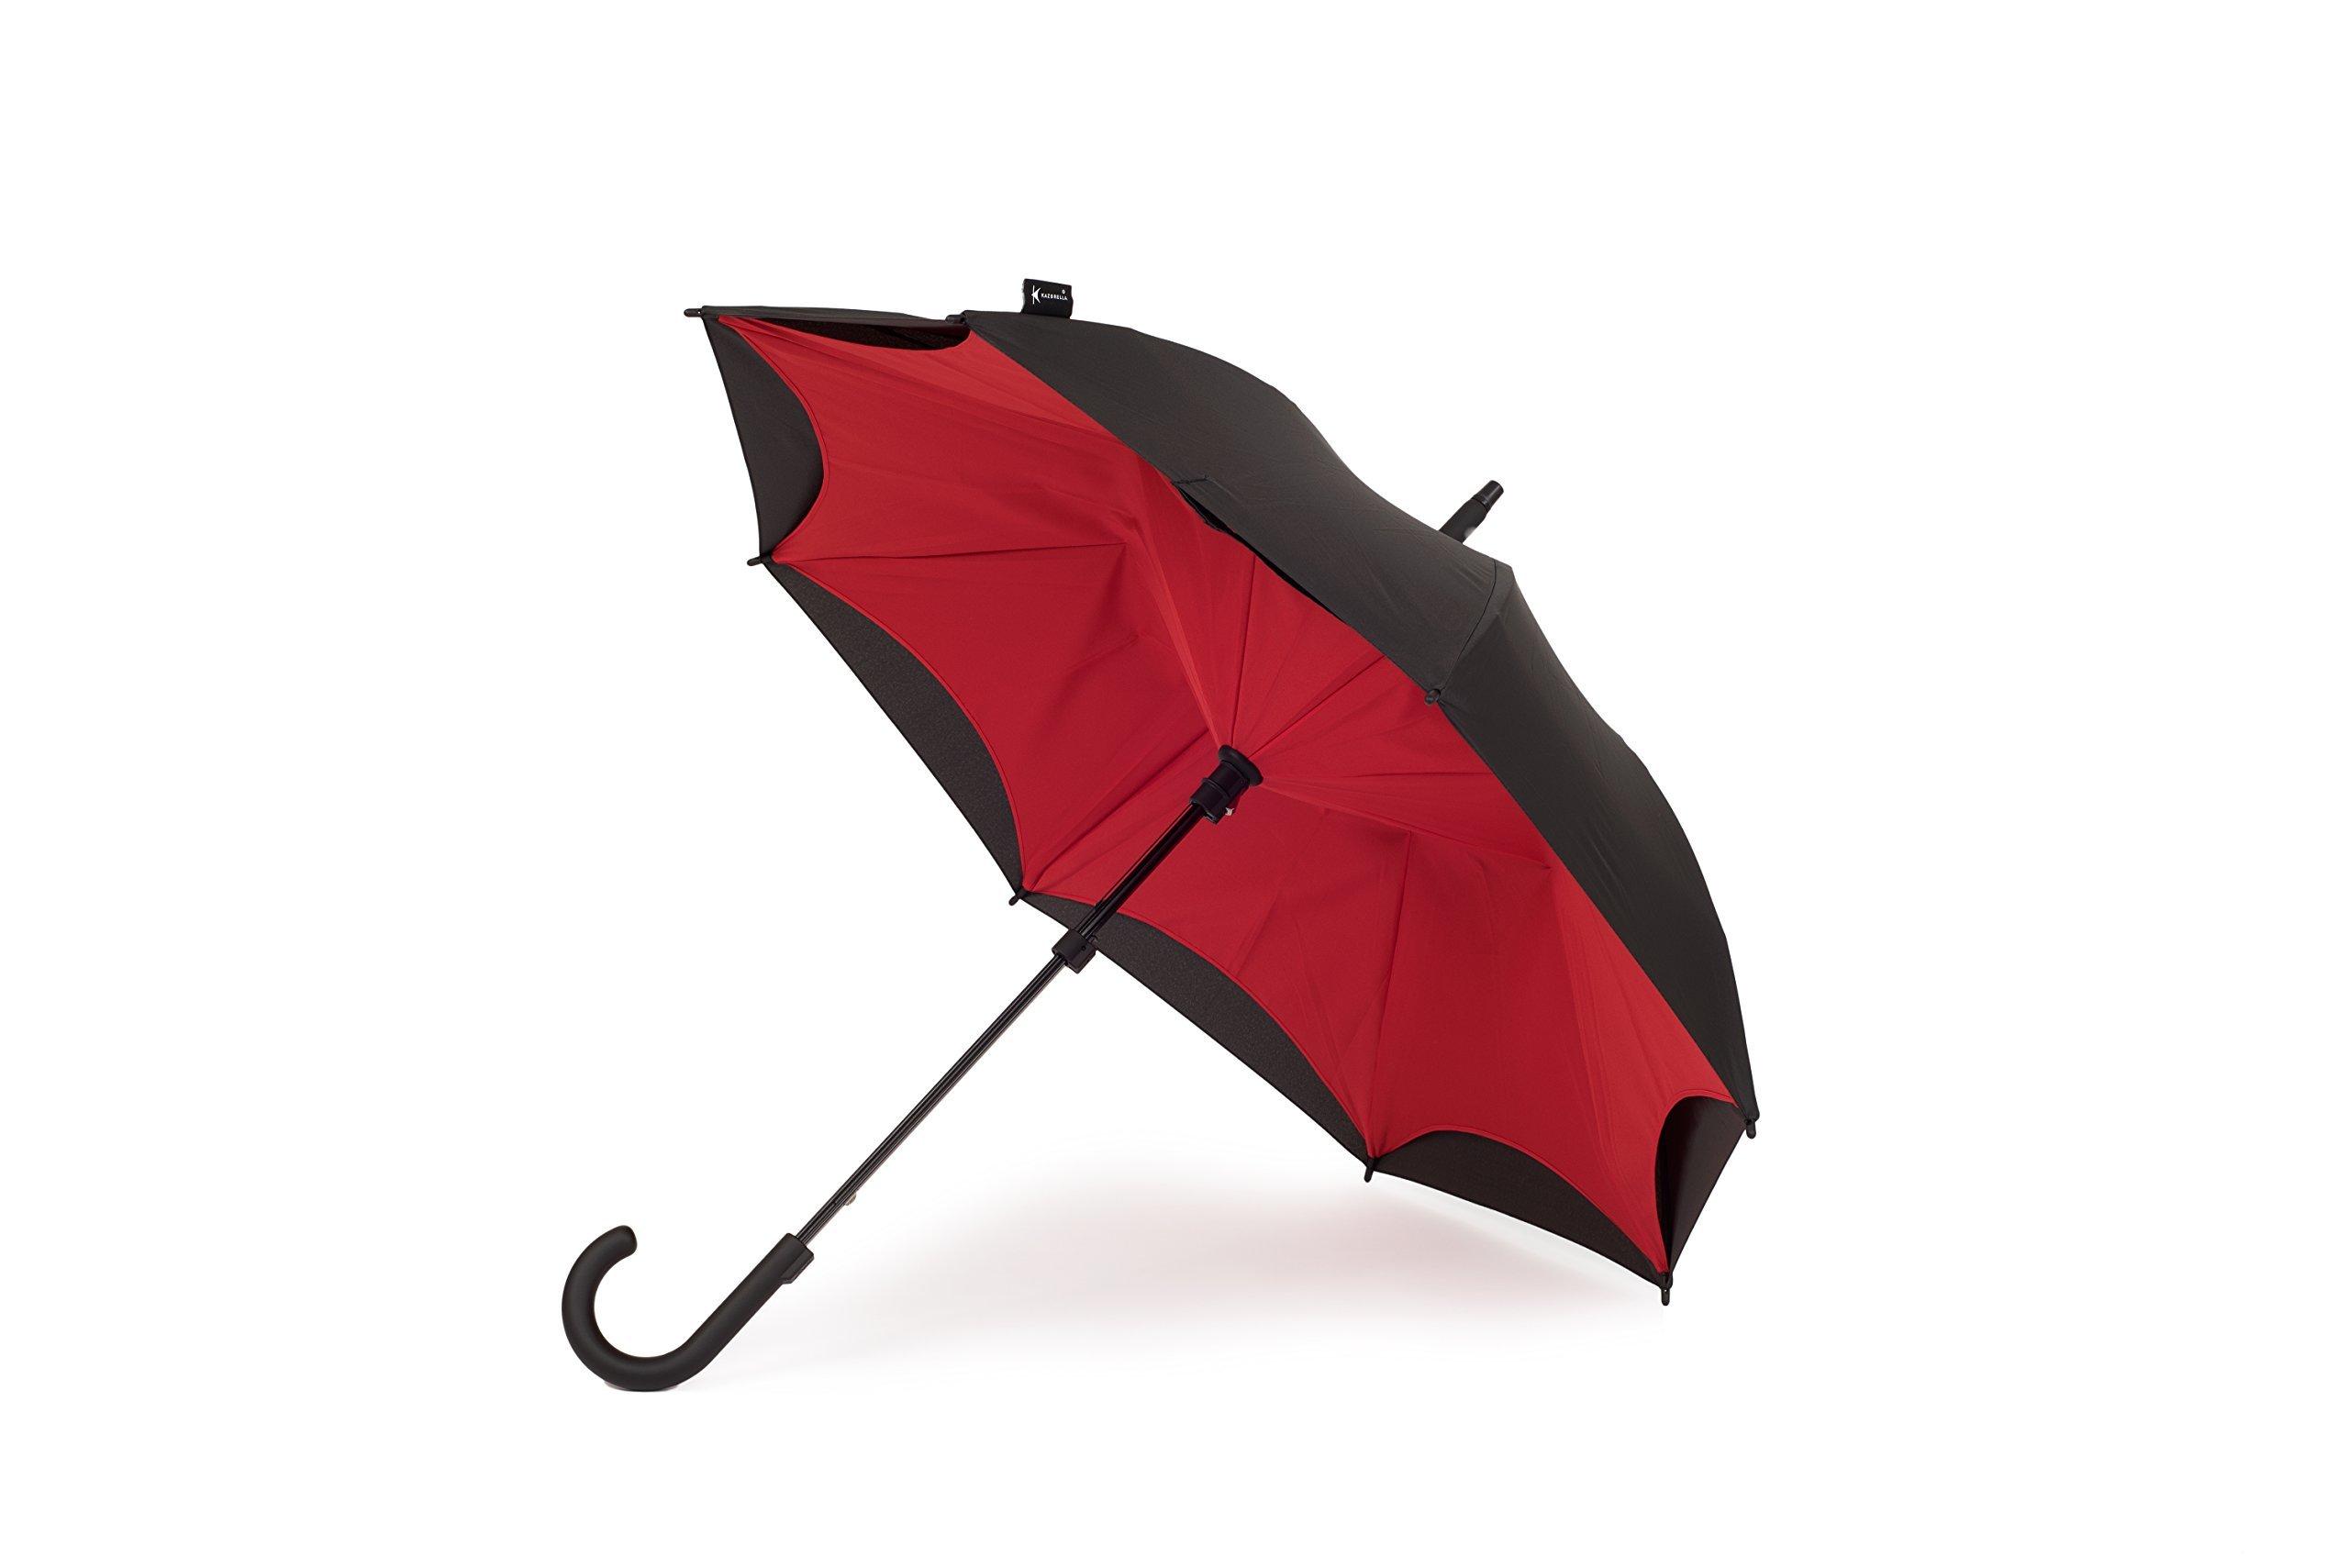 Kazbrella Reverse Folding Inverted Umbrella Double Layer Wind Proof UV Proof (Red_Blac)